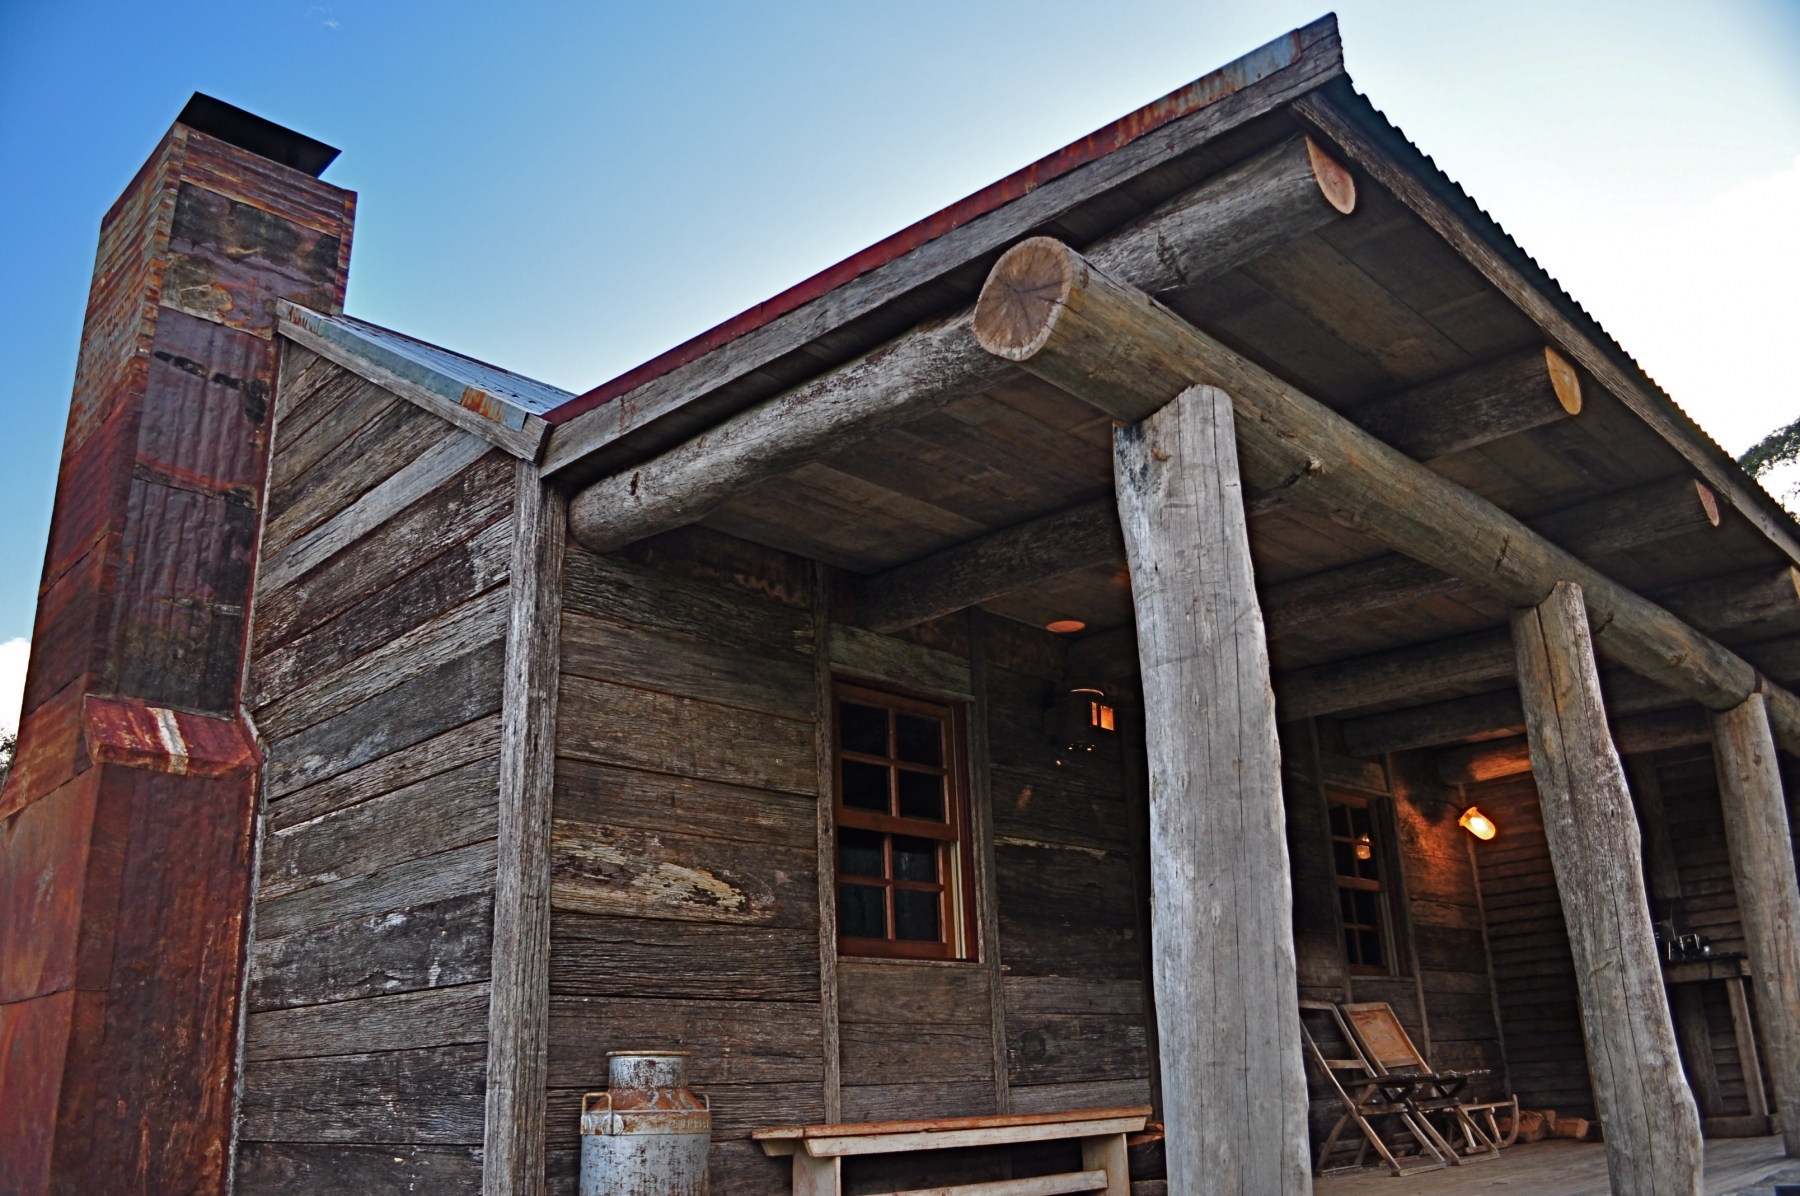 Moonbah River Hut - Luxury riverside log cabin with large open log fireplace